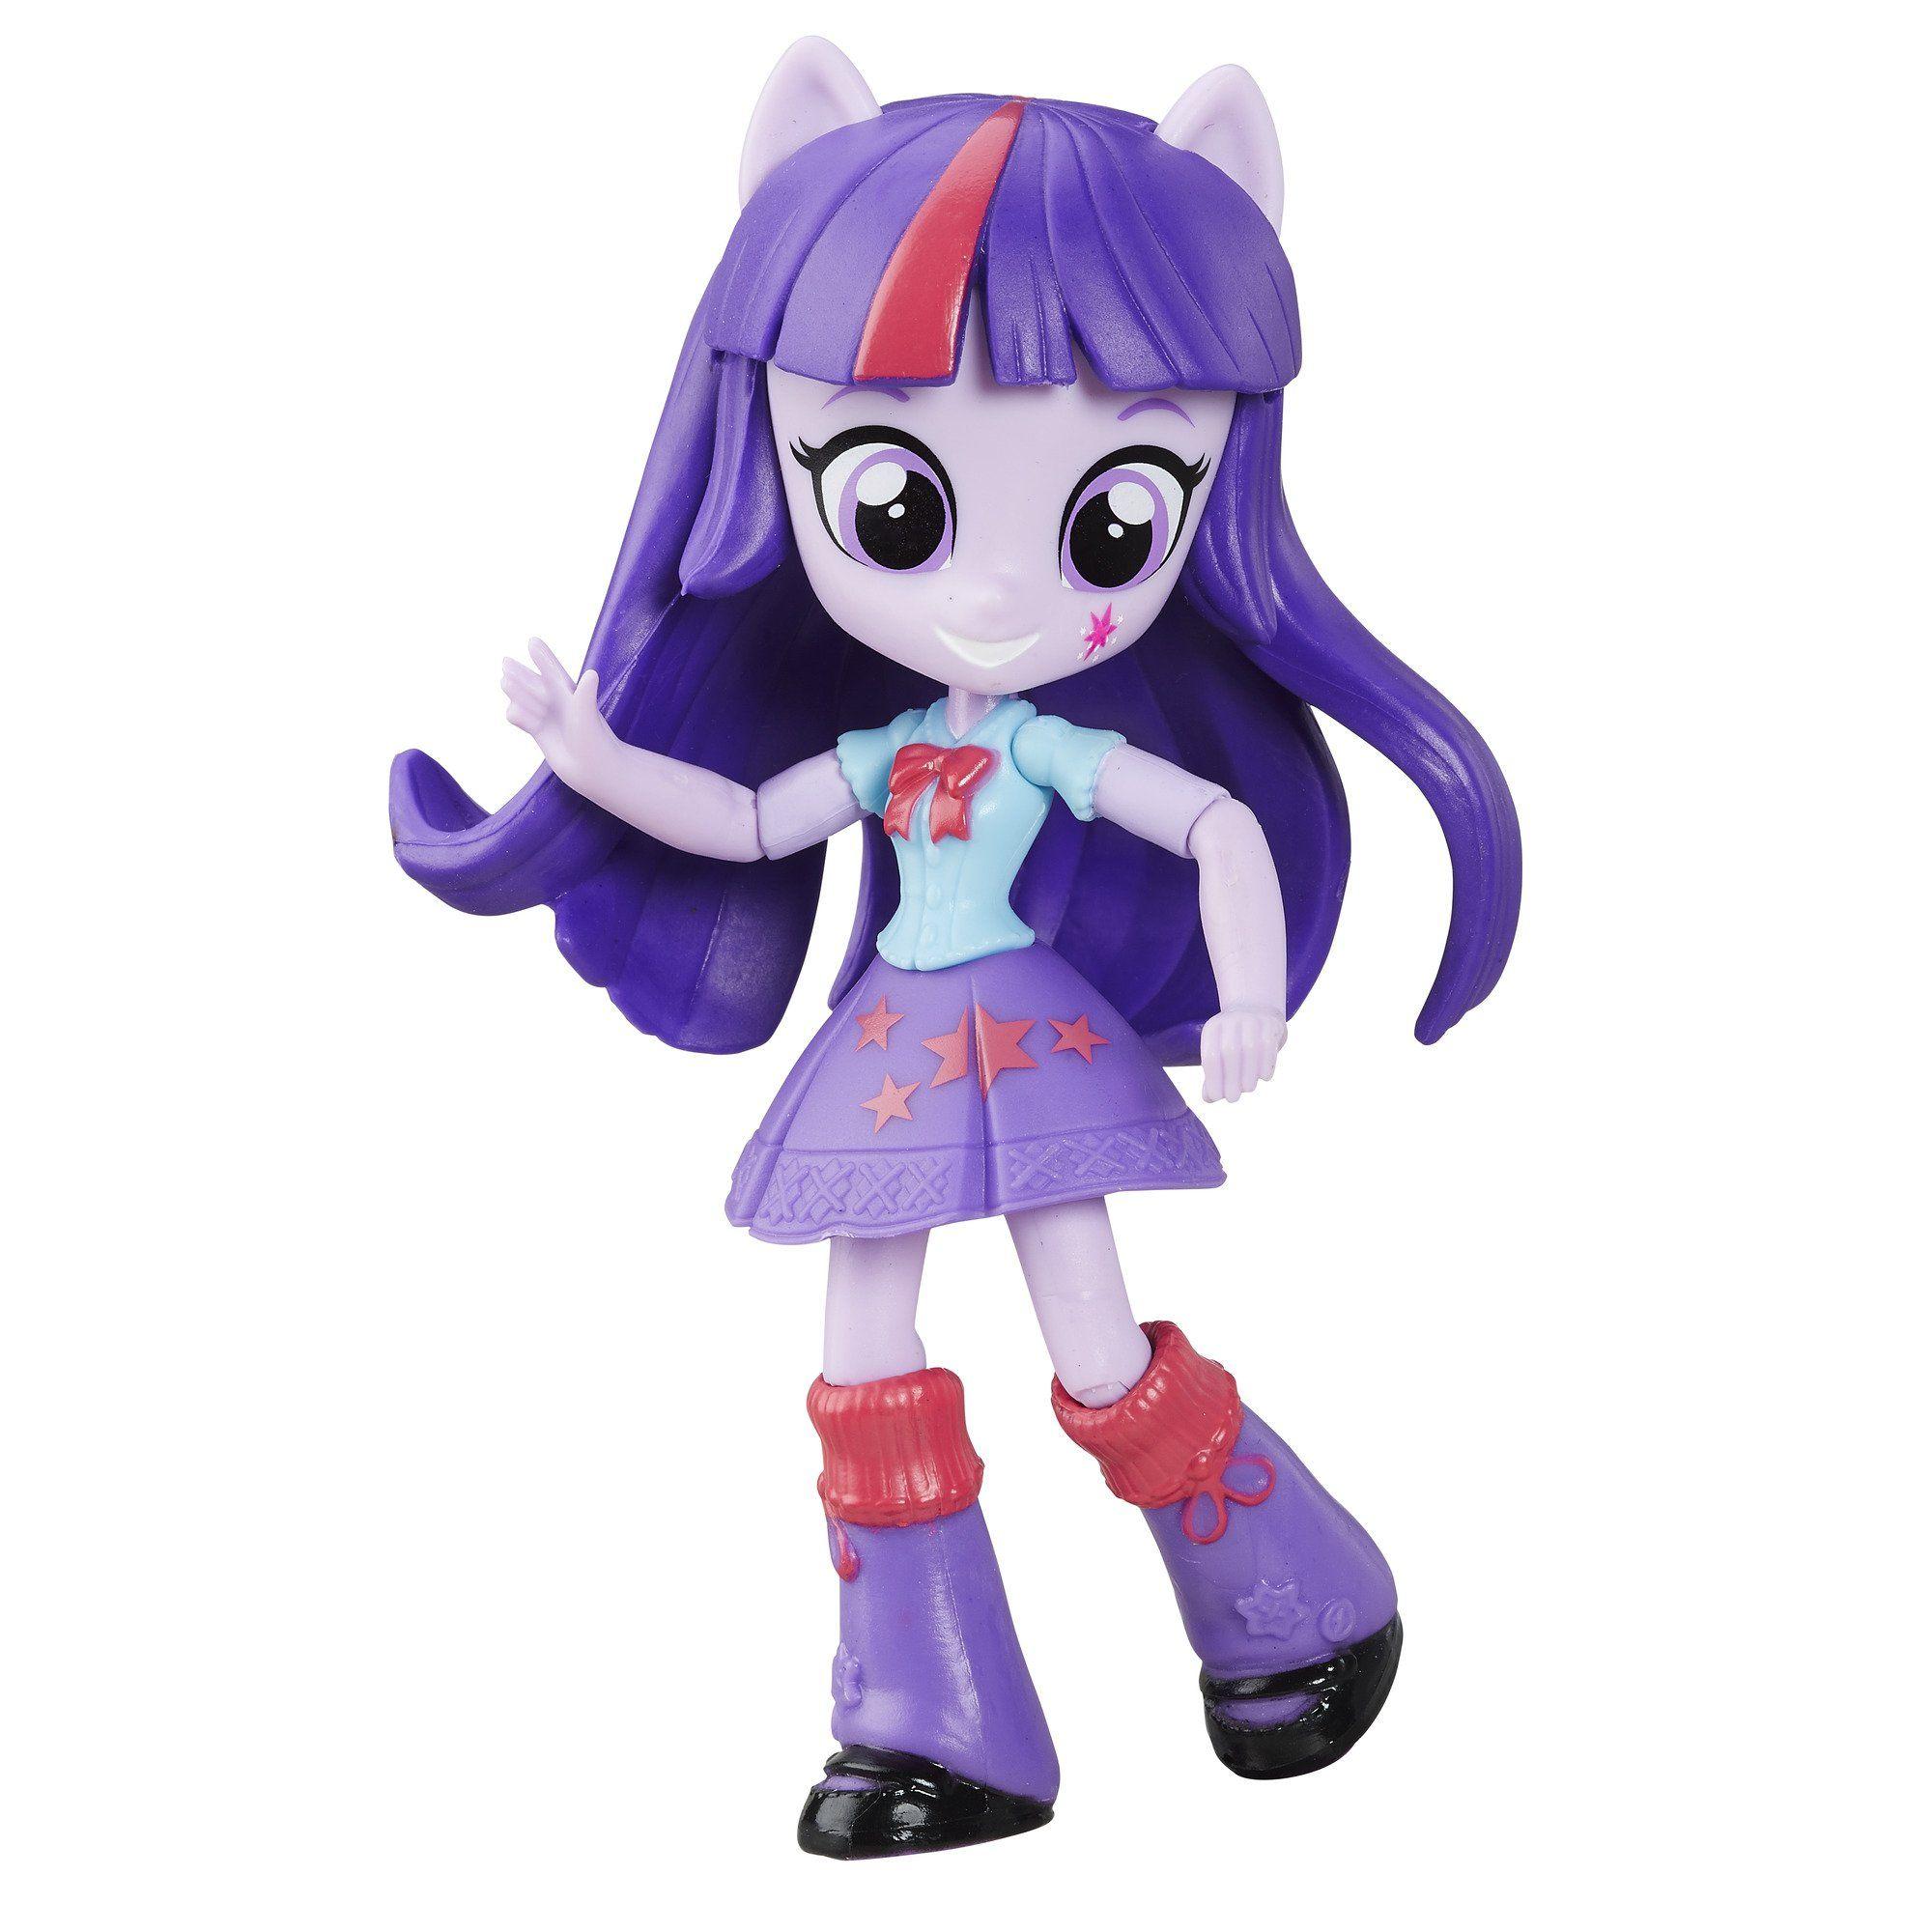 Twilight Sparkle Equestria Girls Dibujos Para Colorear De My Little Pony Humanas Amazon Com My Little Pony Equestria Girls Minis Twilight Sparkle